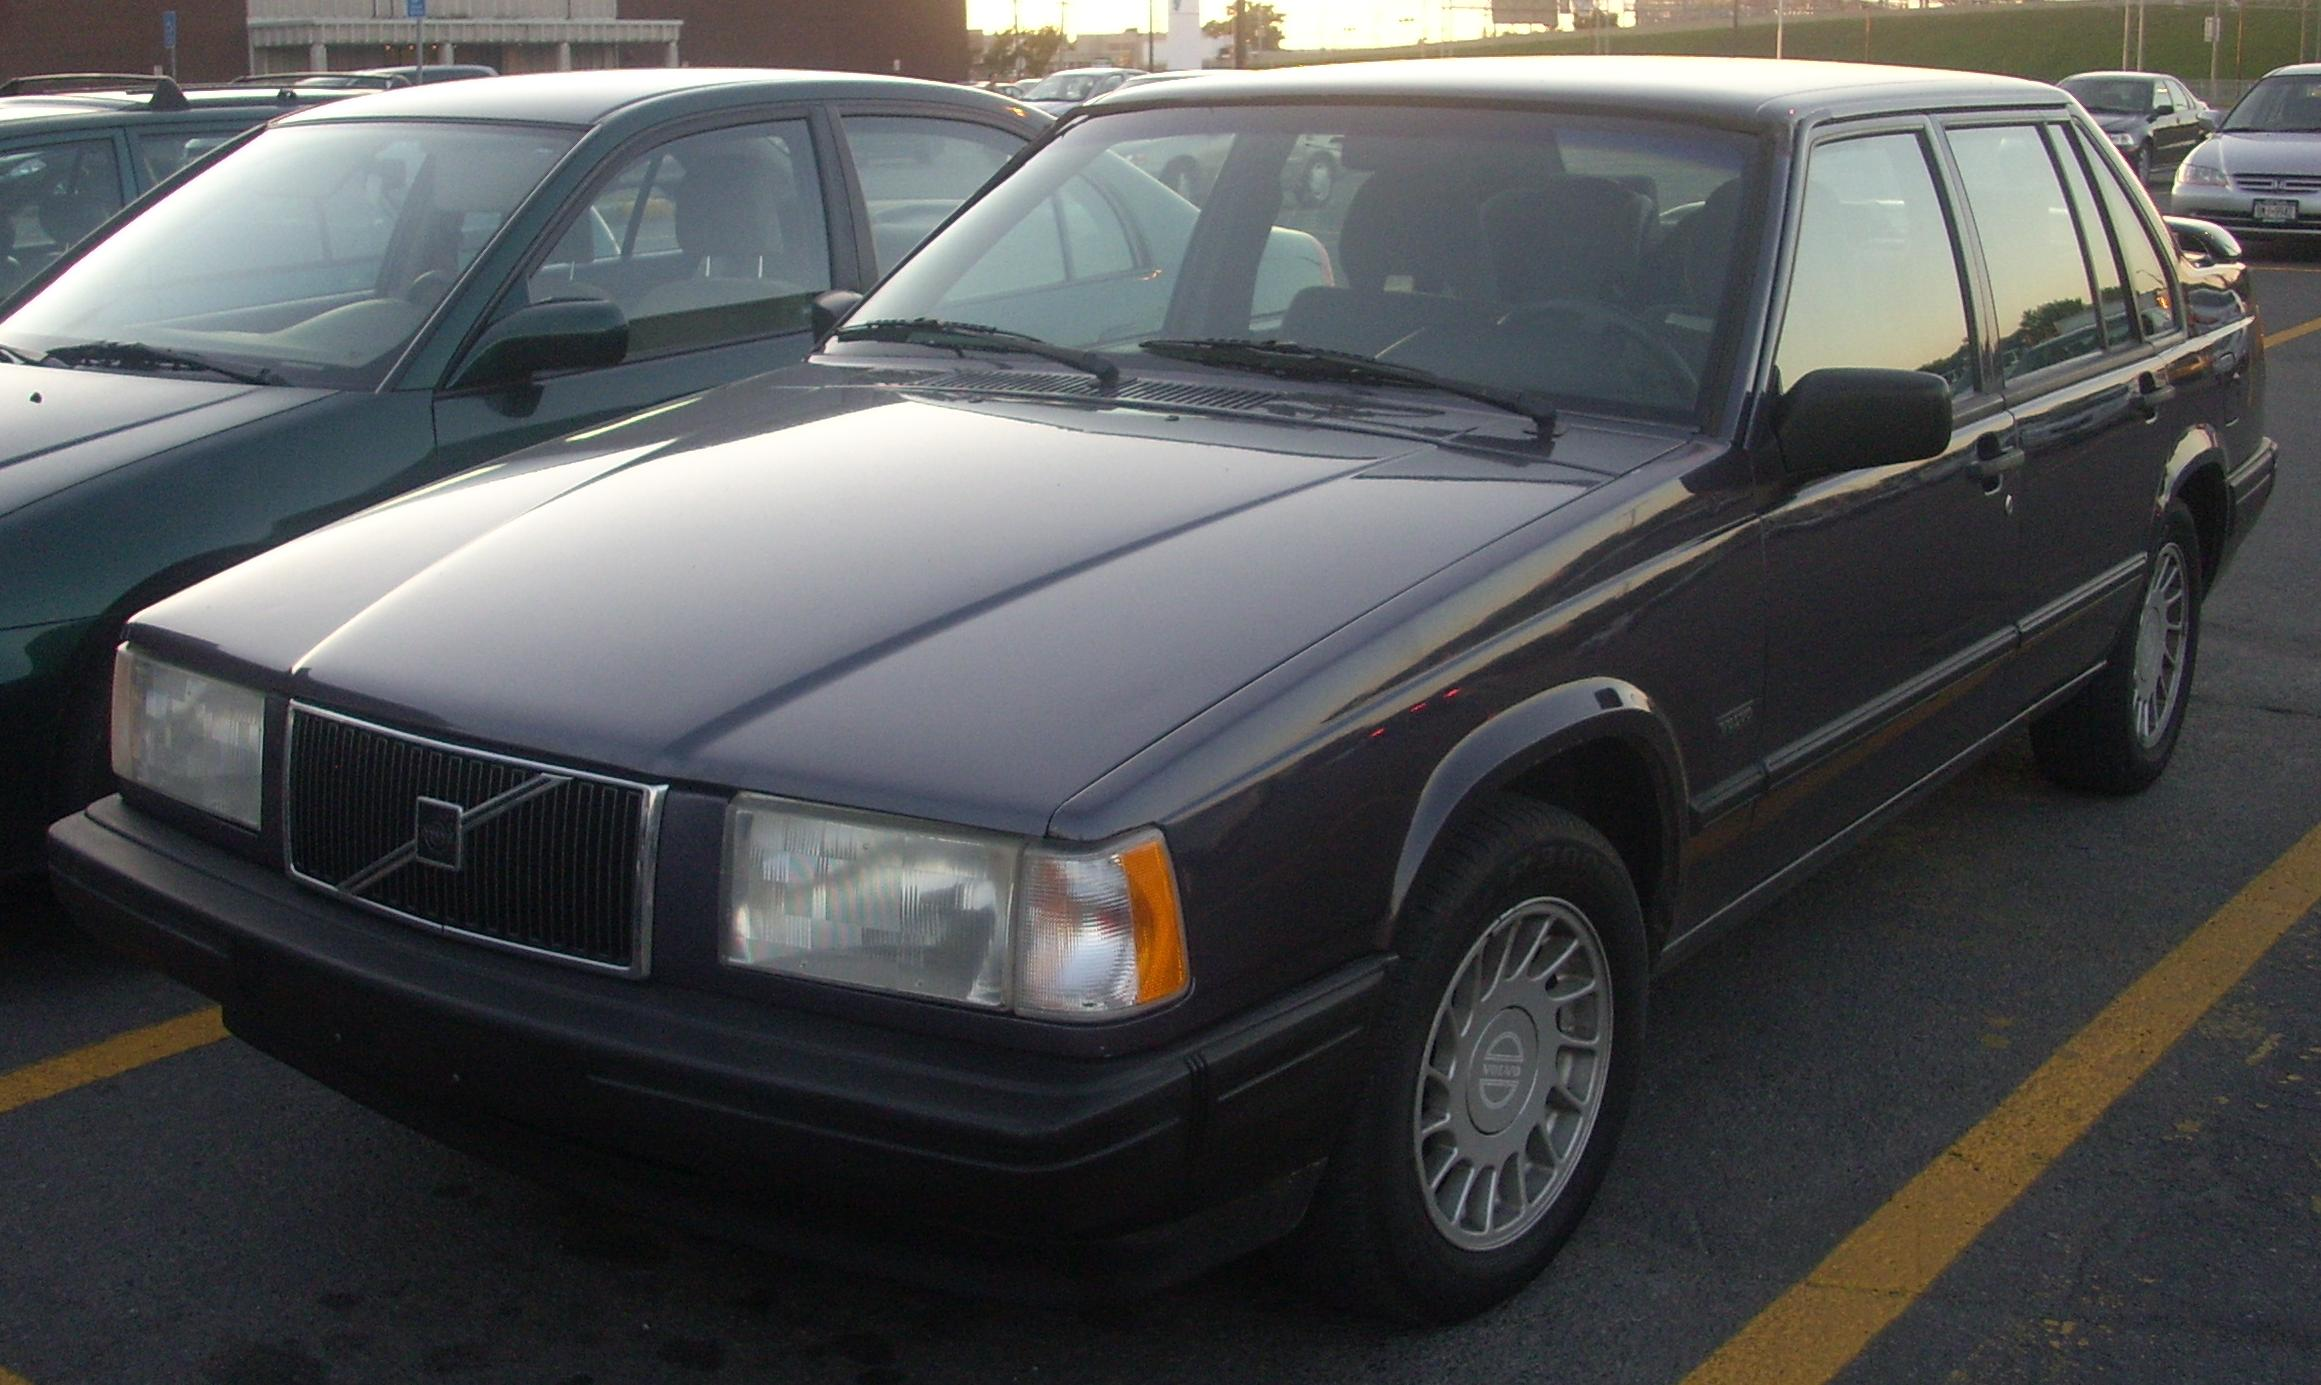 File:'92-'93 Volvo 940 Sedan.JPG - Wikimedia Commons